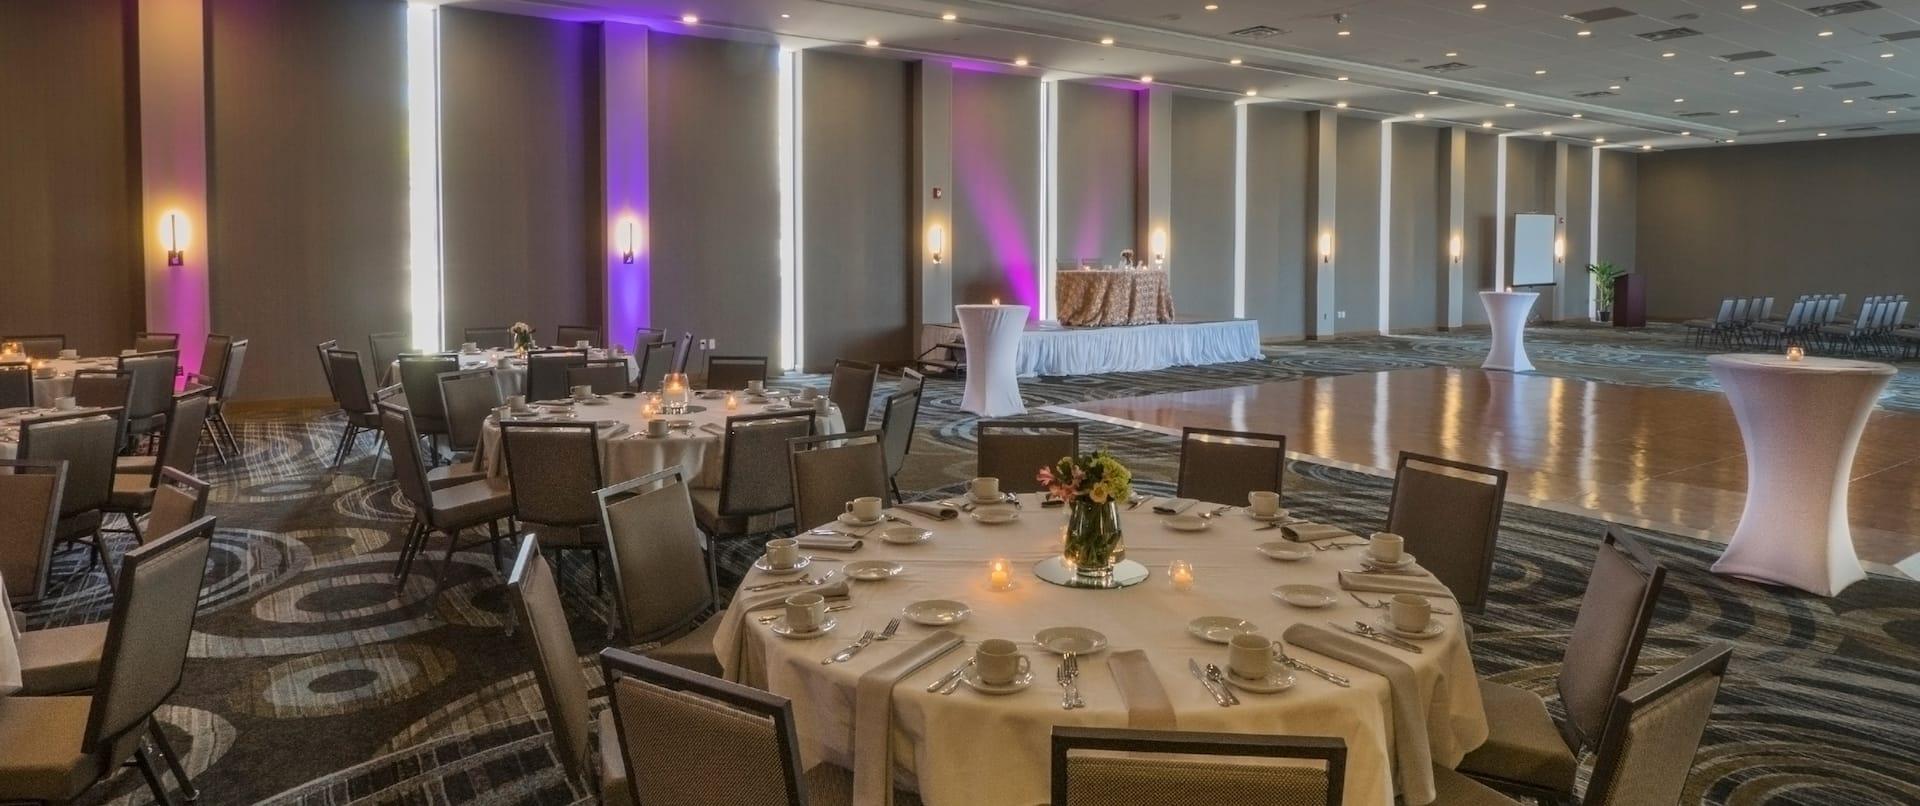 Ballroom in Wedding Setup with Dance Floor